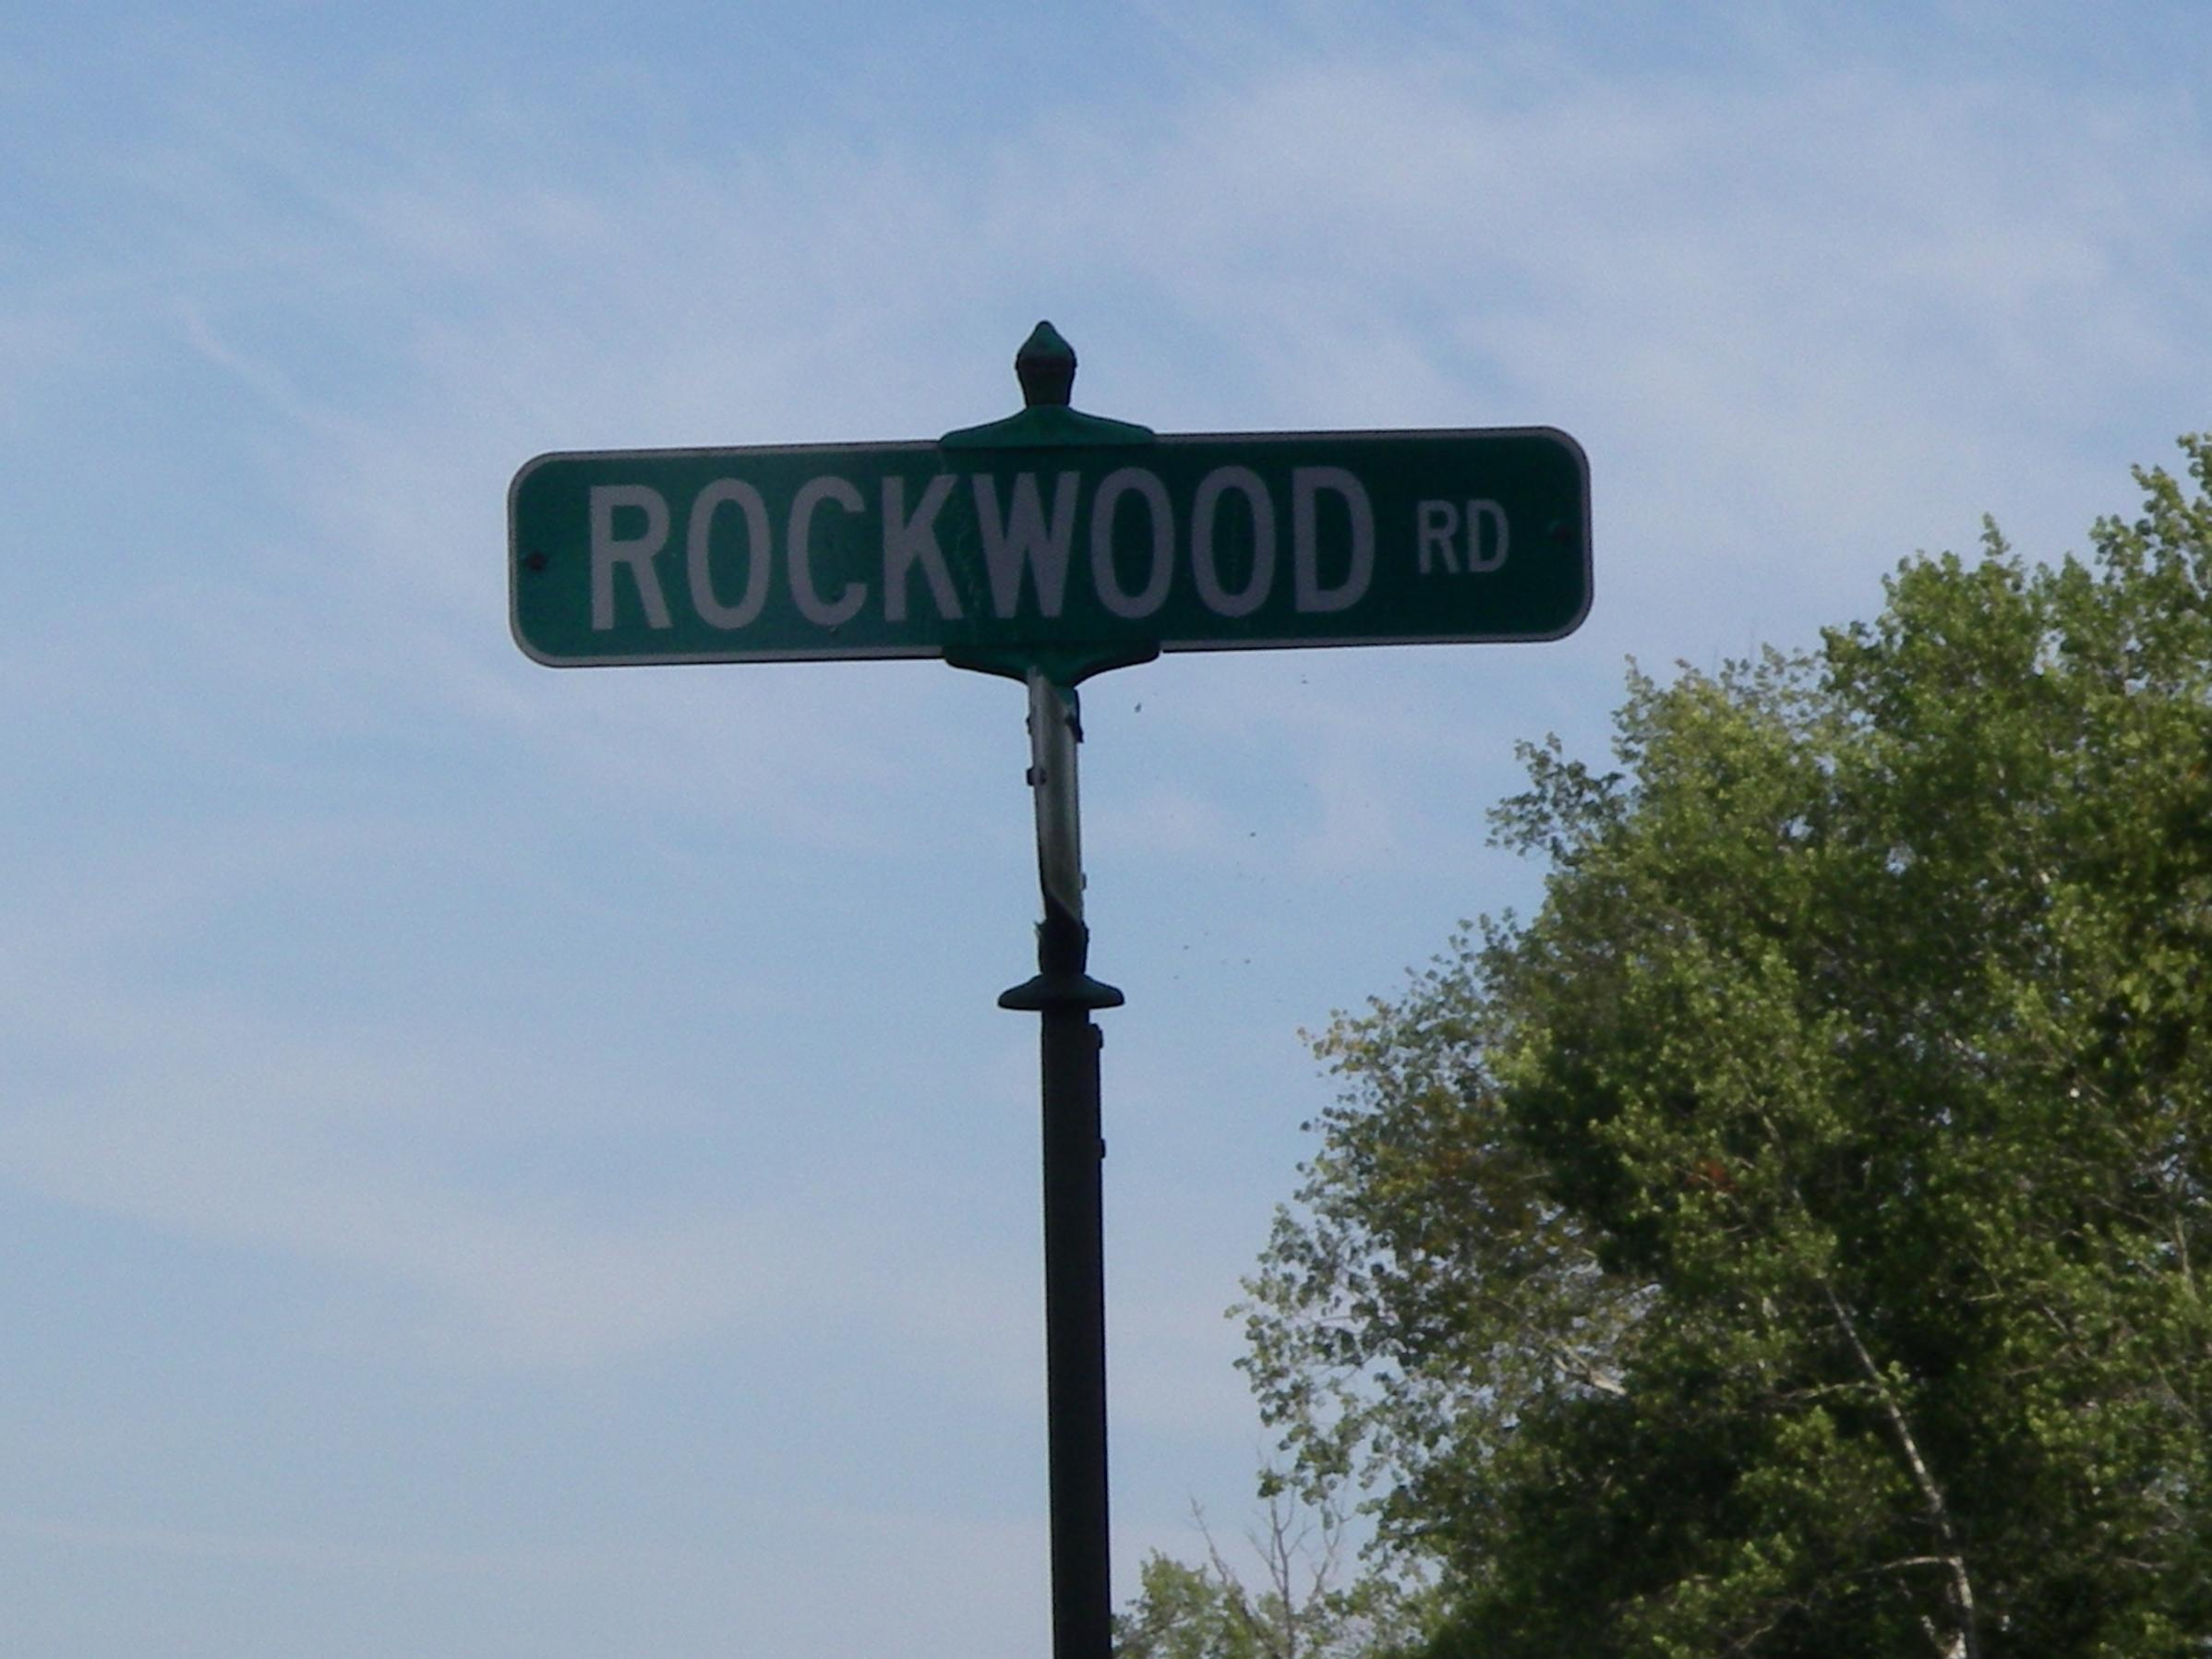 A favorite road